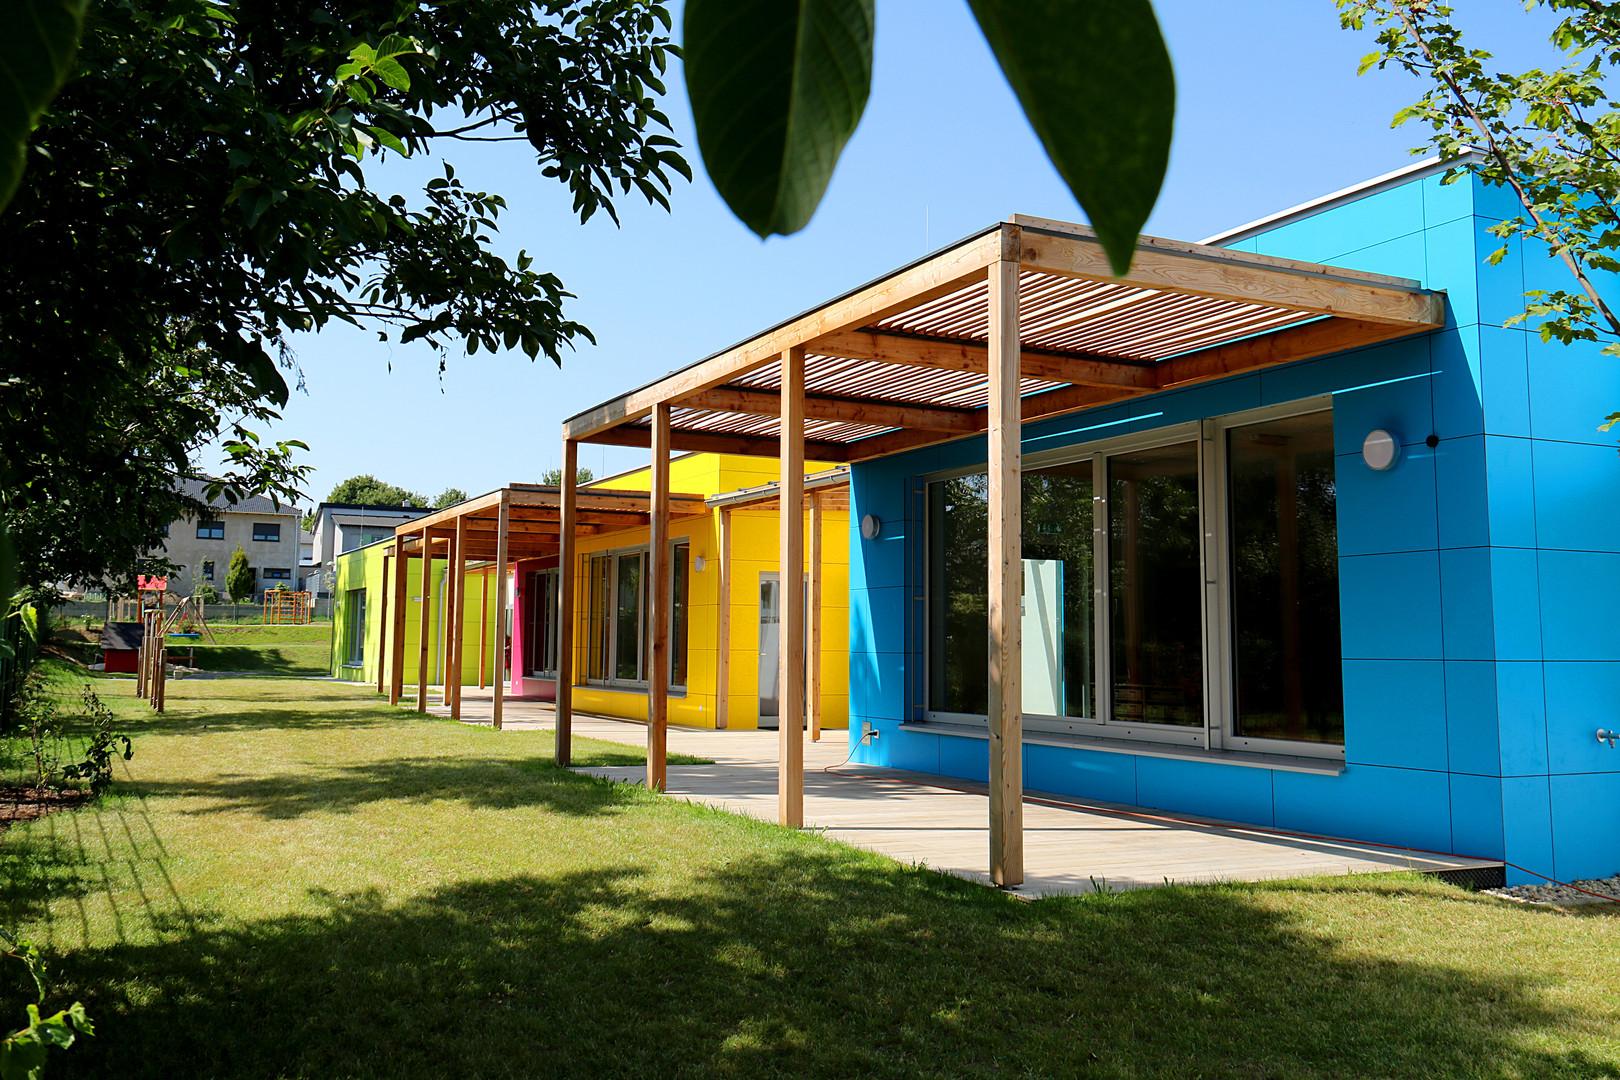 Kindergarten Mistelbach Nord.JPG